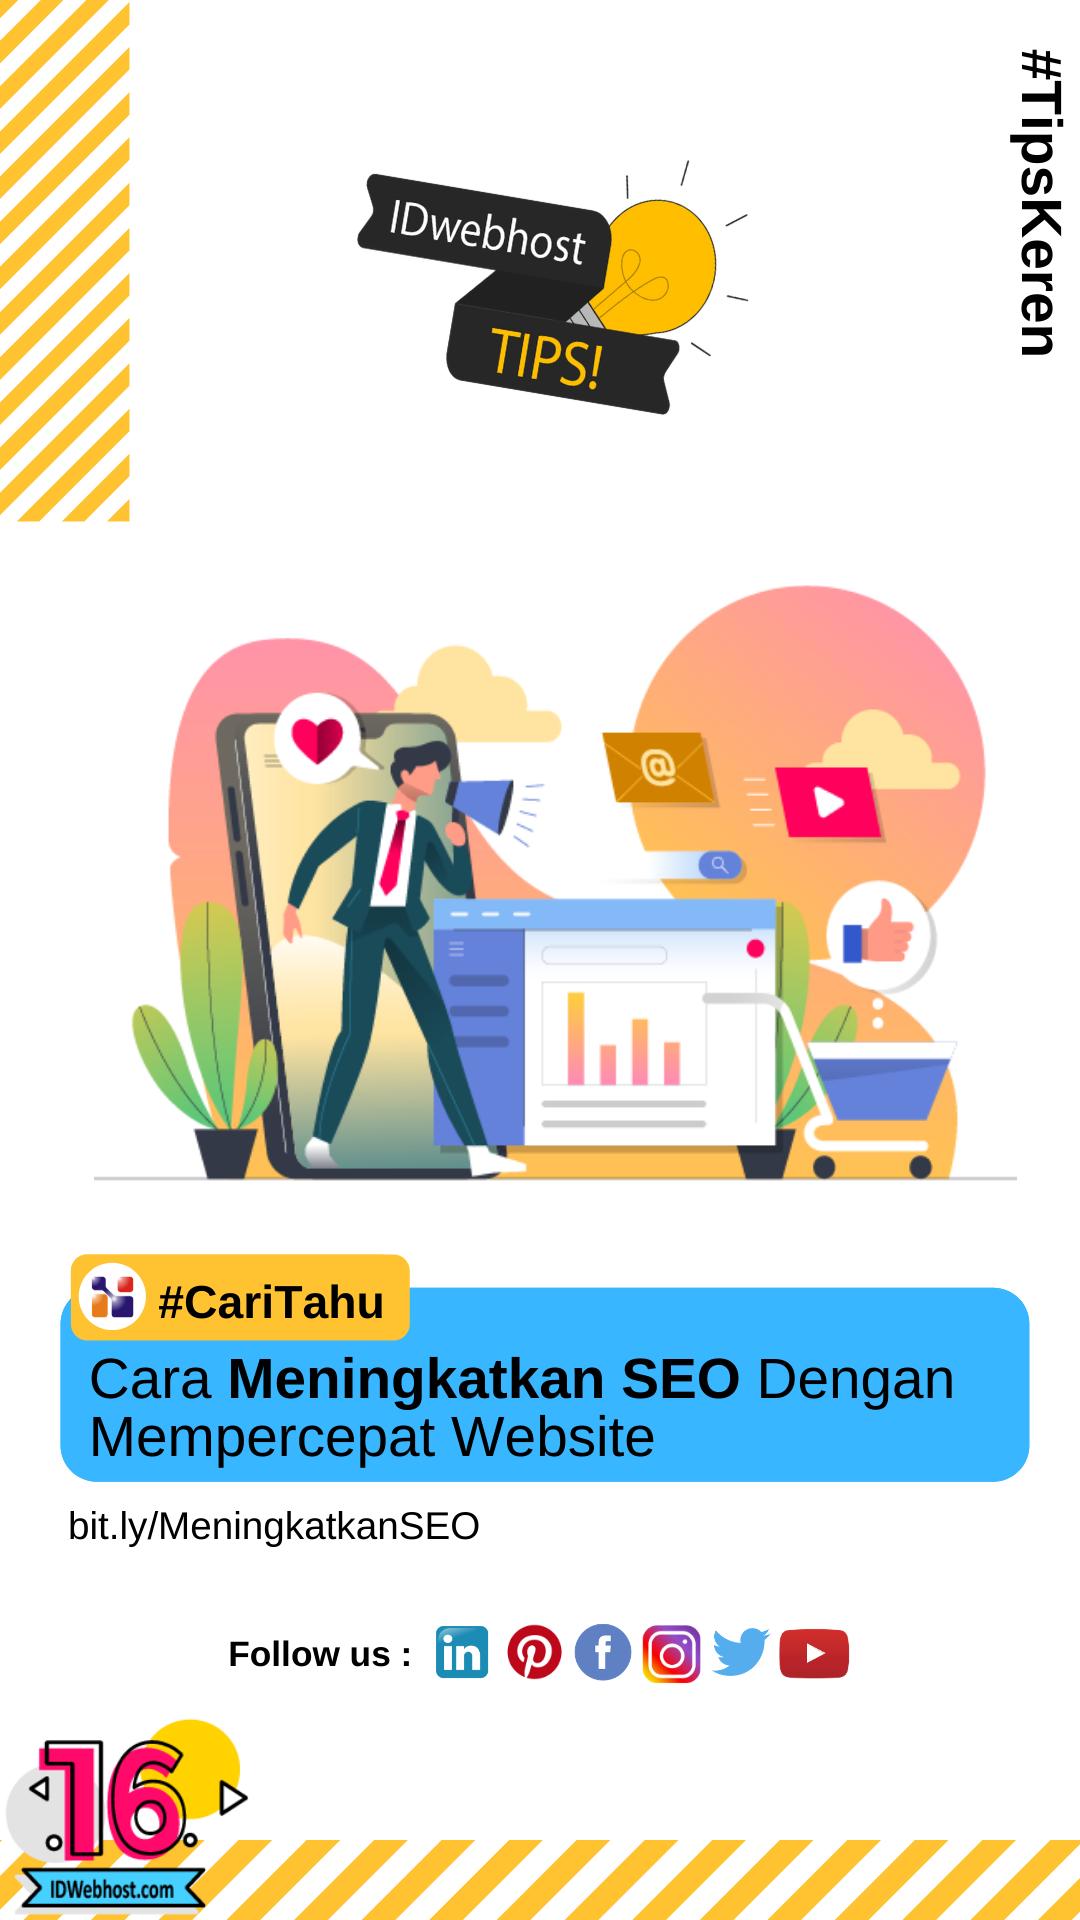 Cara Meningkatkan Seo Dengan Mempercepat Website Website Tahu Tips